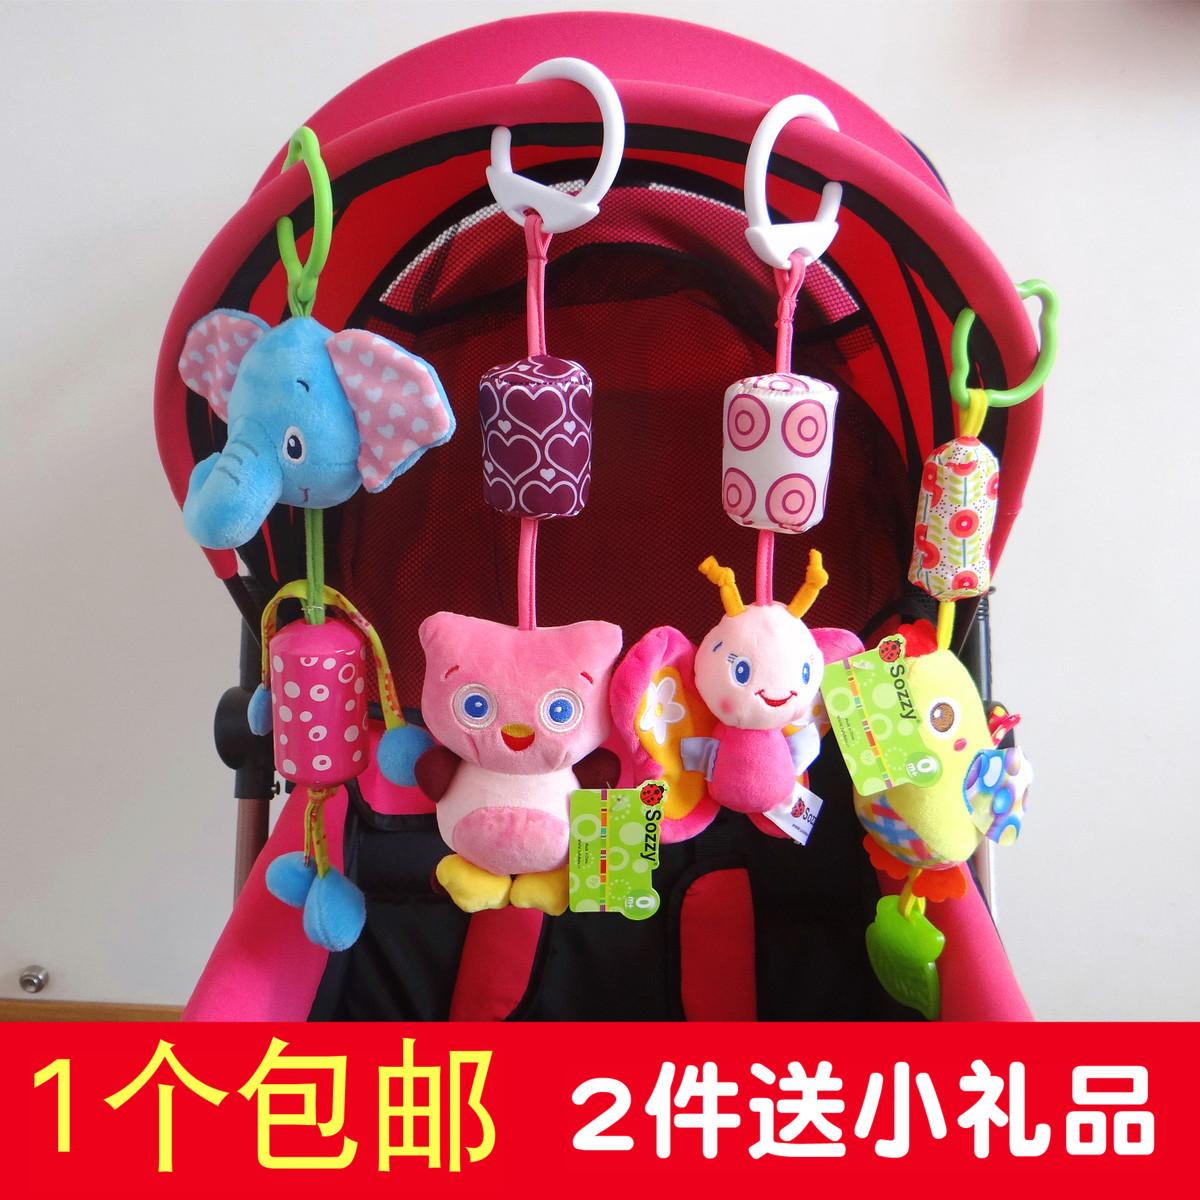 Прикроватные игрушки / Погремушки Артикул 522842852969